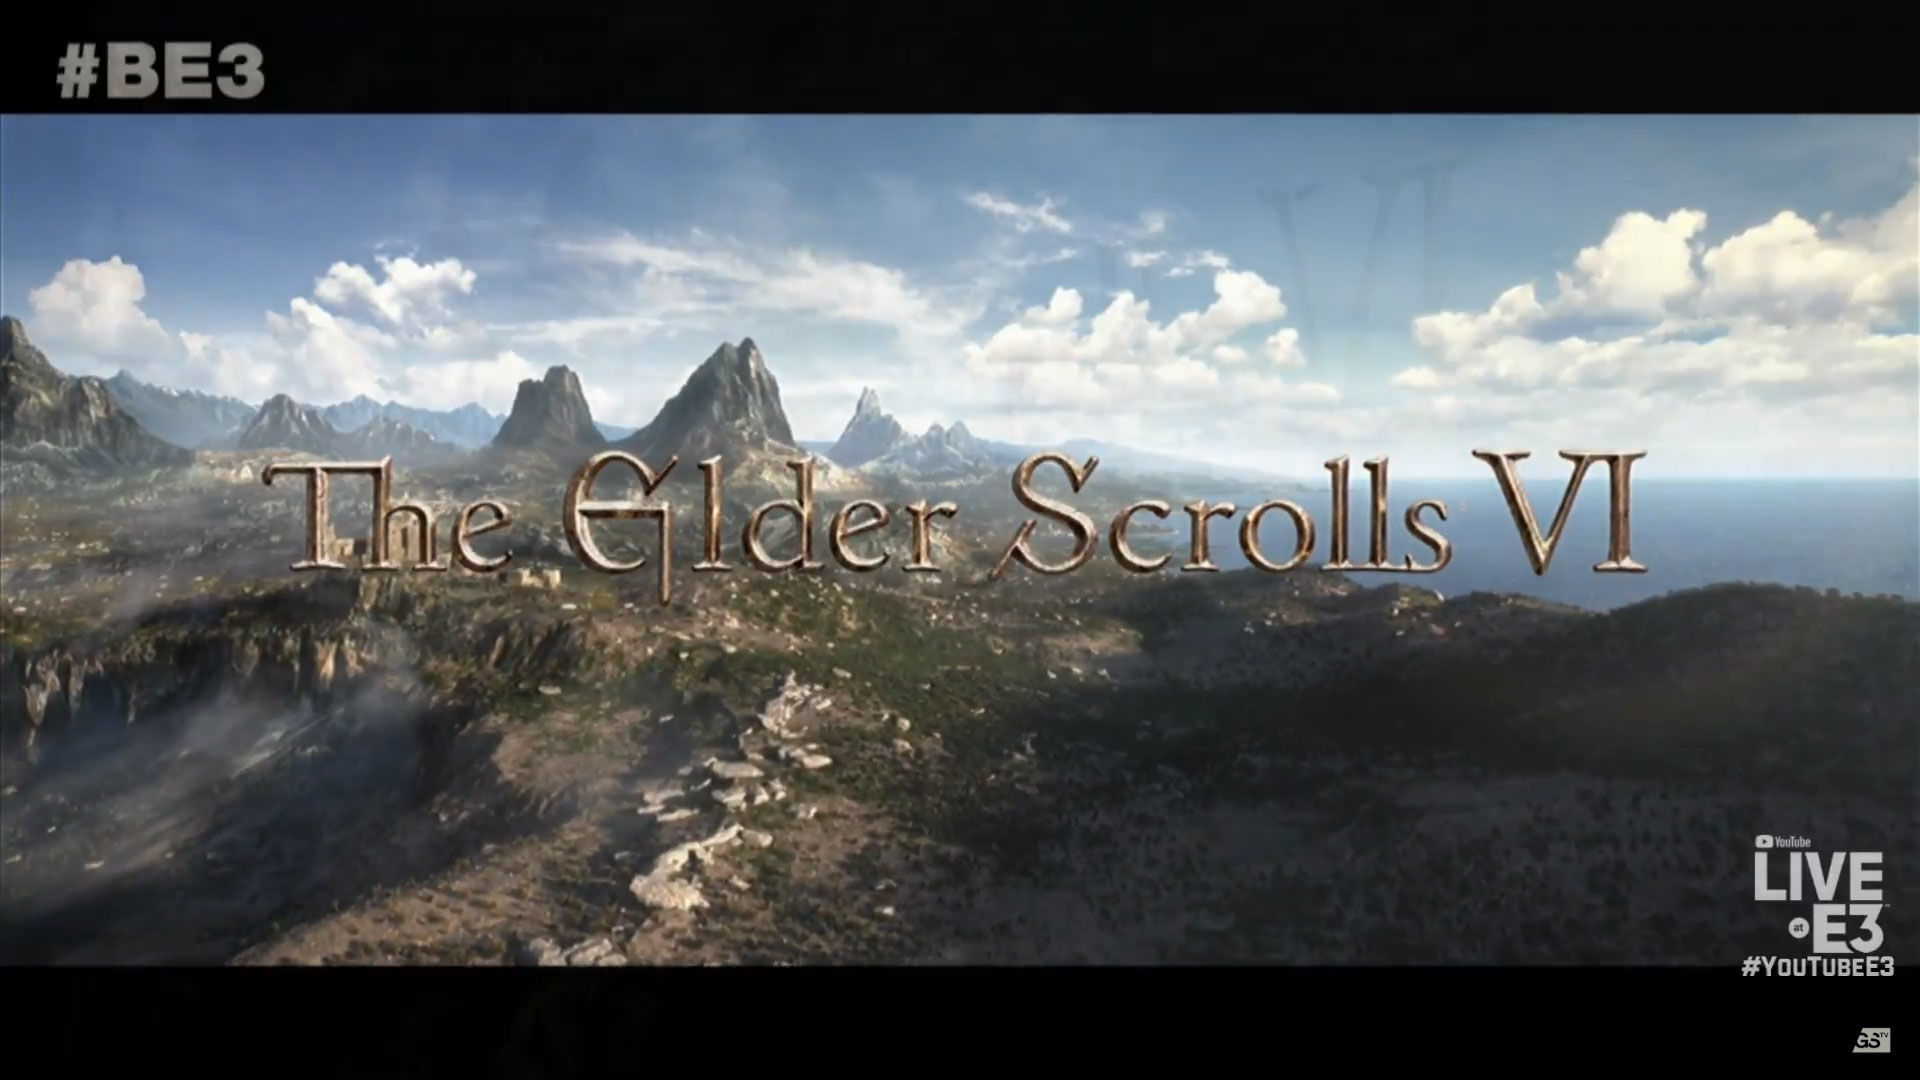 The Elder Scrolls VI e3 2018 bethesda